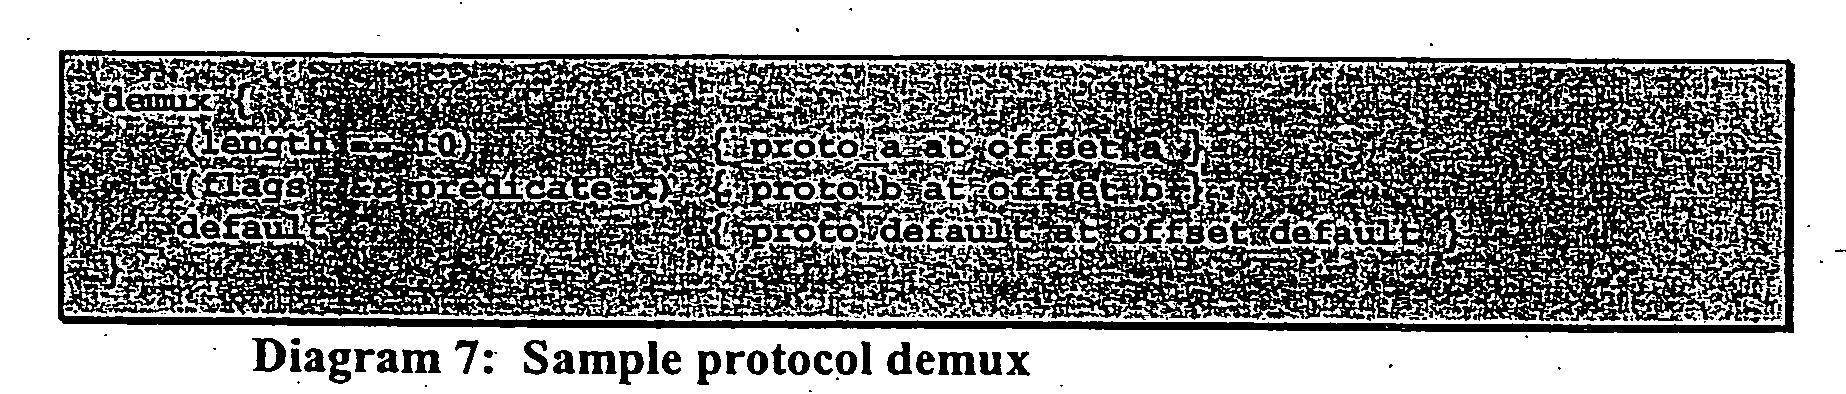 Figure US20040148382A1-20040729-P00009